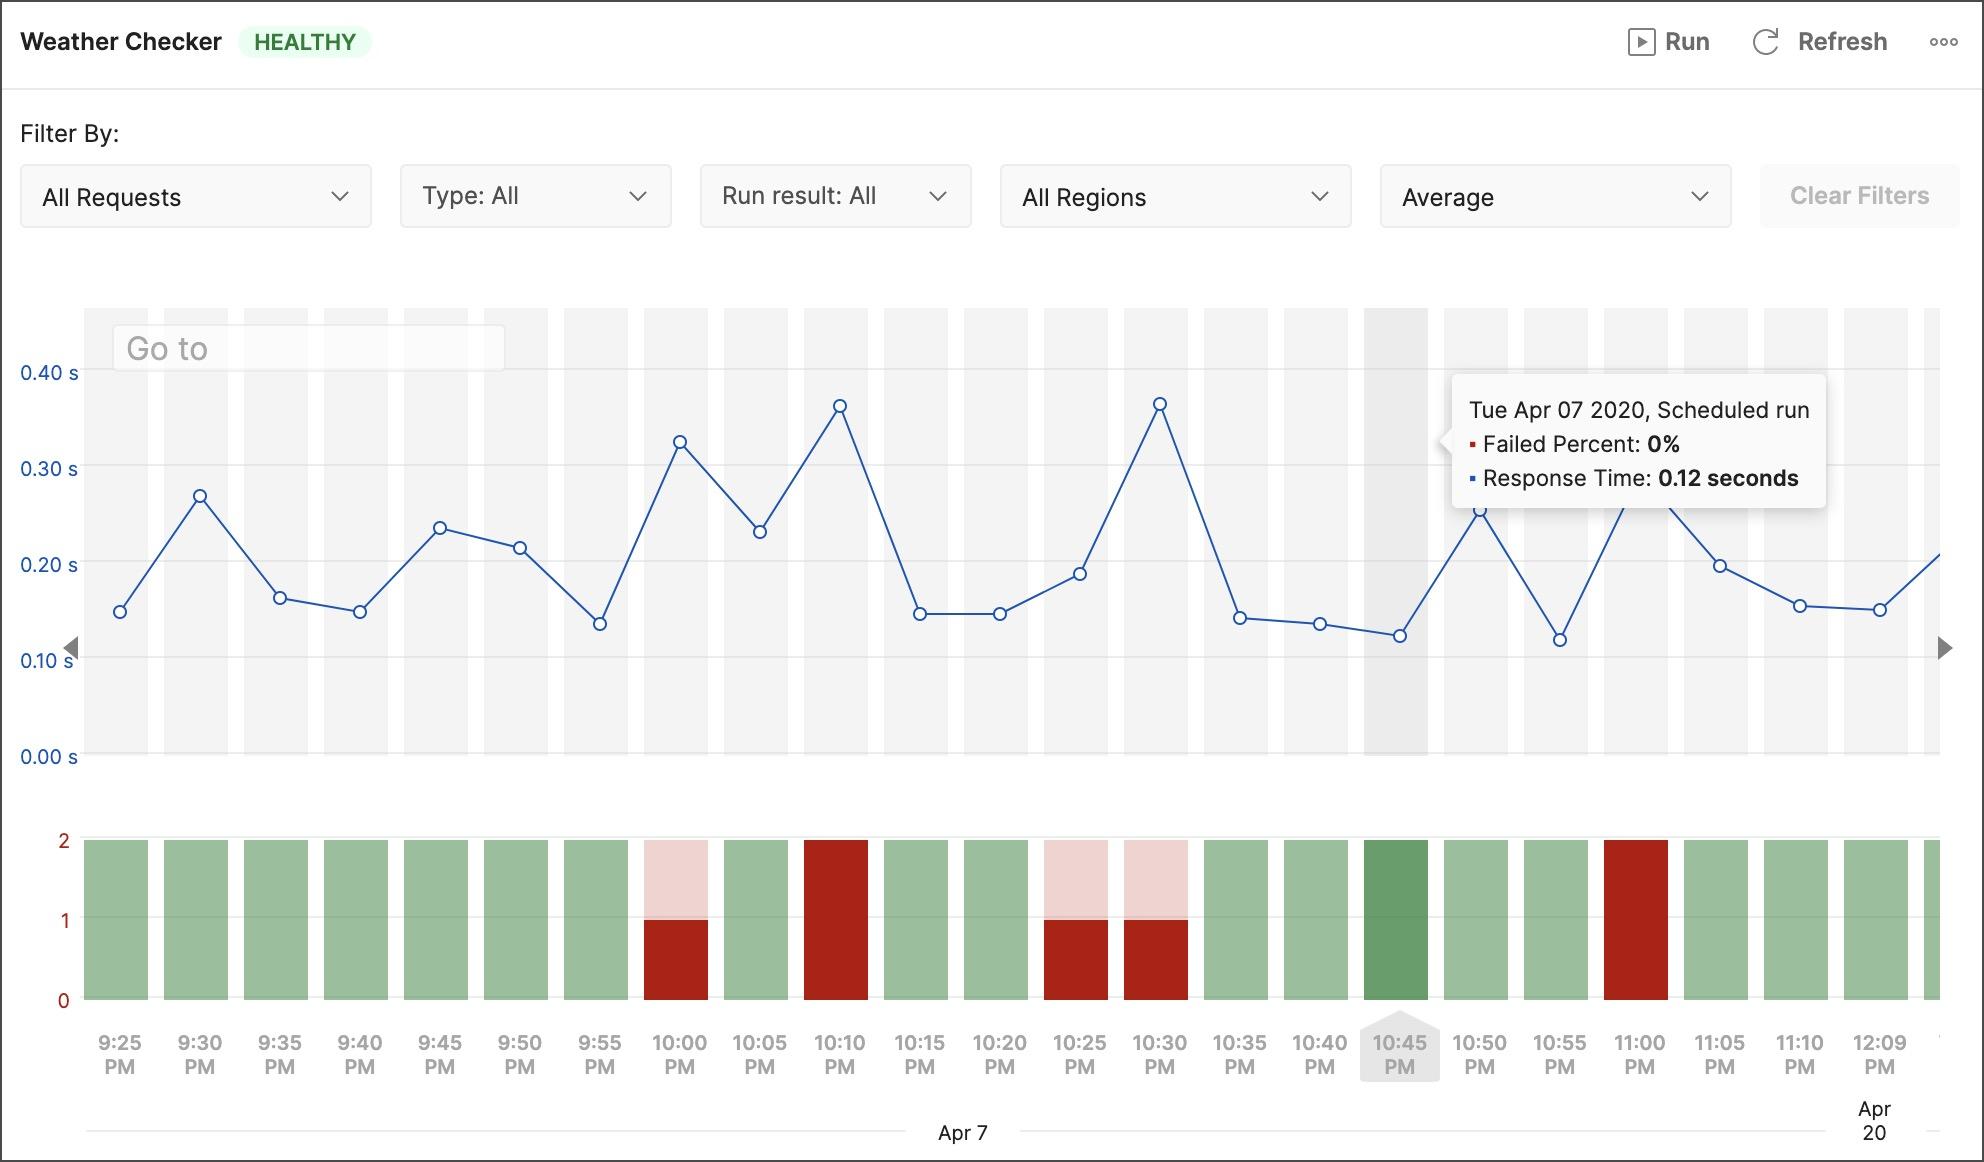 Monitor summary